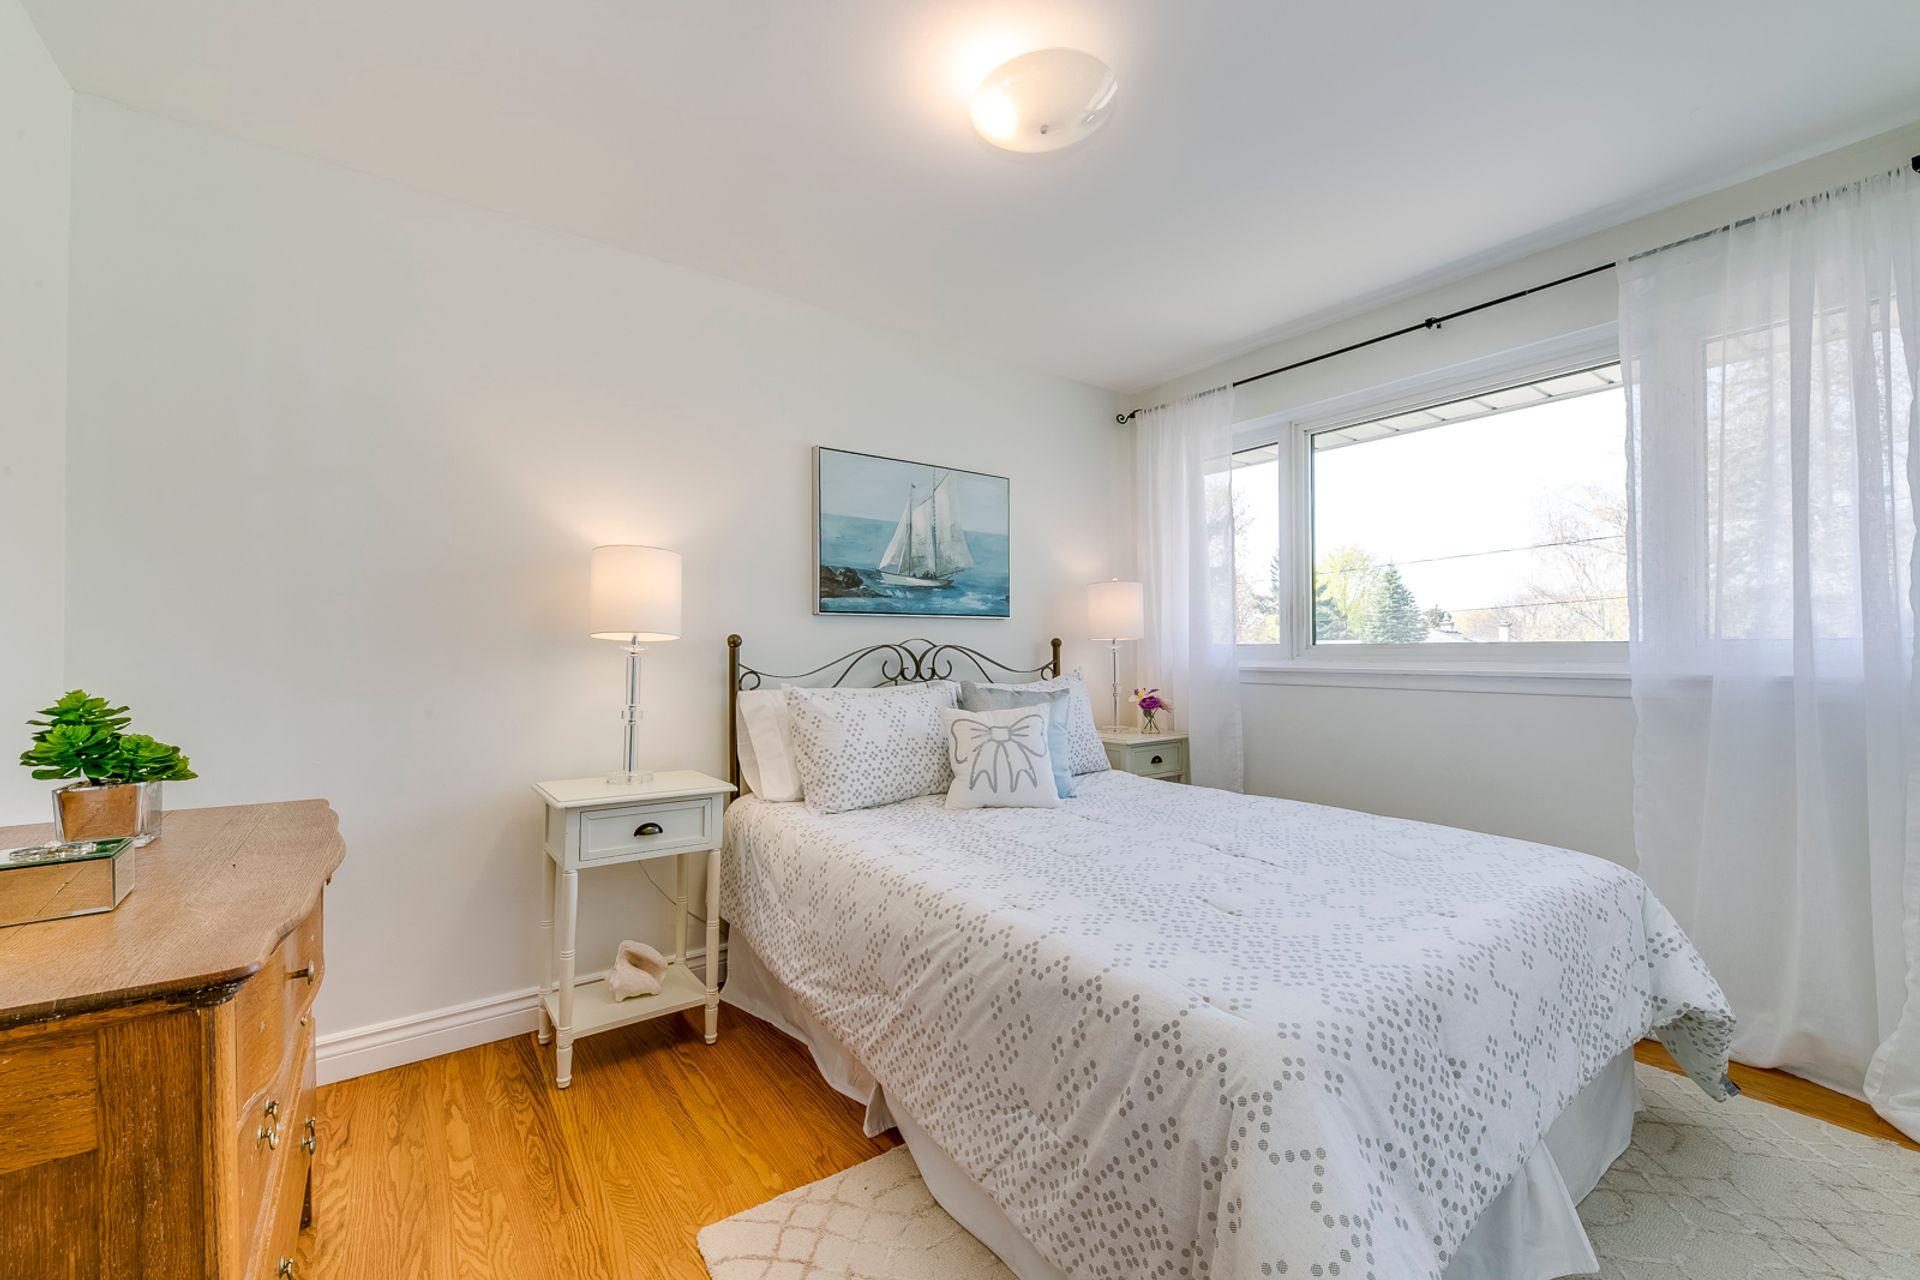 2nd Bedroom -1247 Kensington Park Rd, Oakville - Elite3 & Team at 1247 Kensington Park Road, Iroquois Ridge South, Oakville